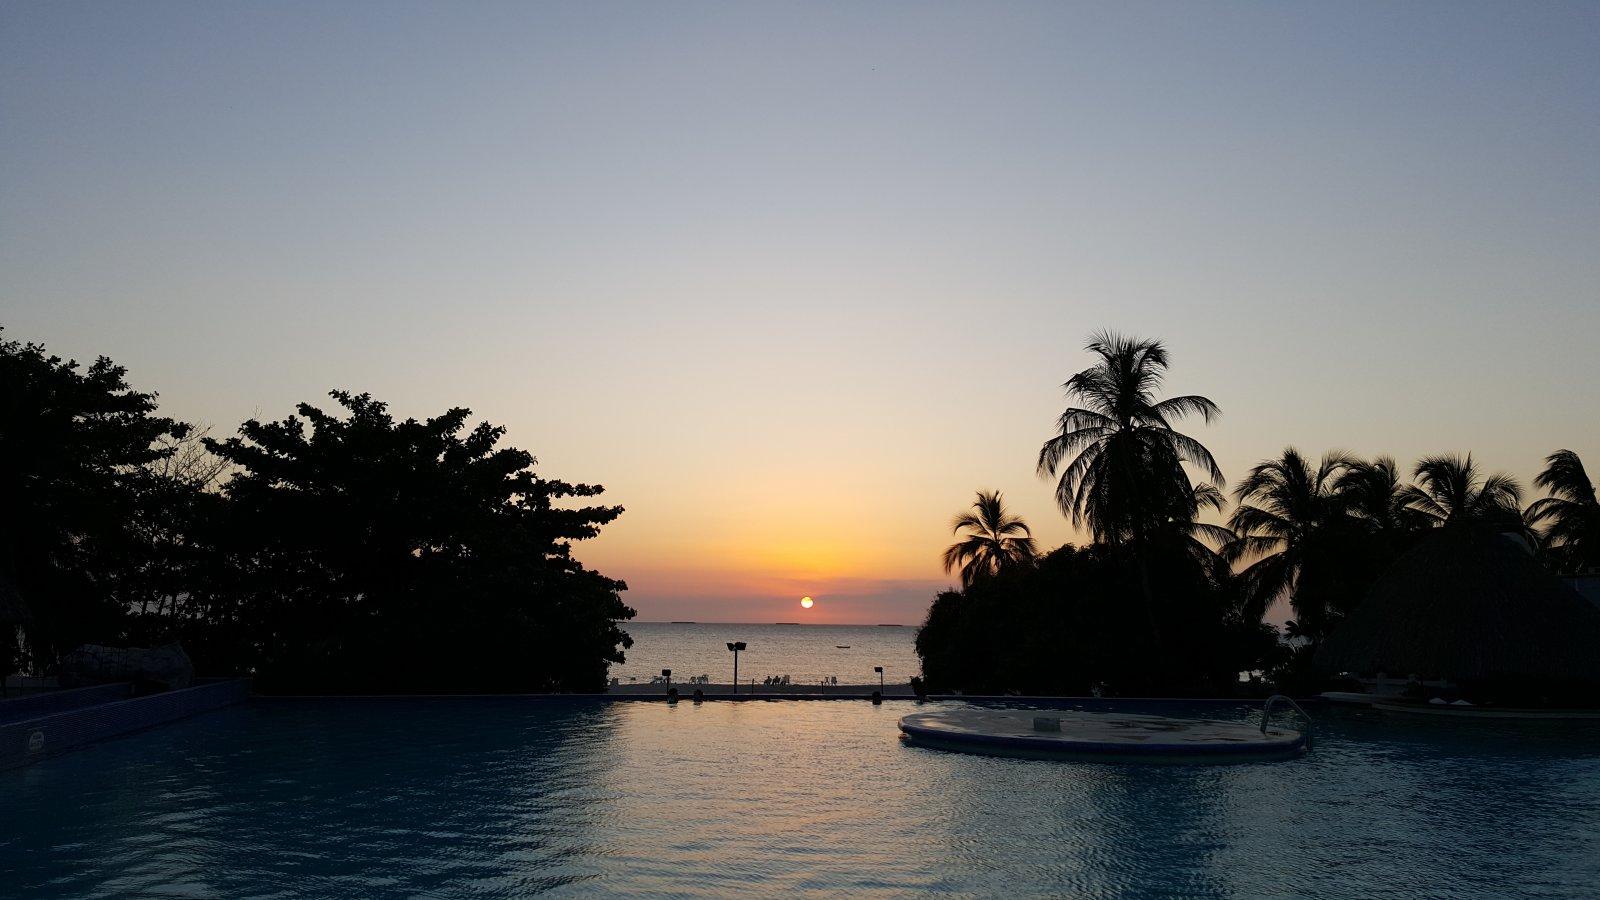 Costa Azul Hotel - Santa Marta, Colombia